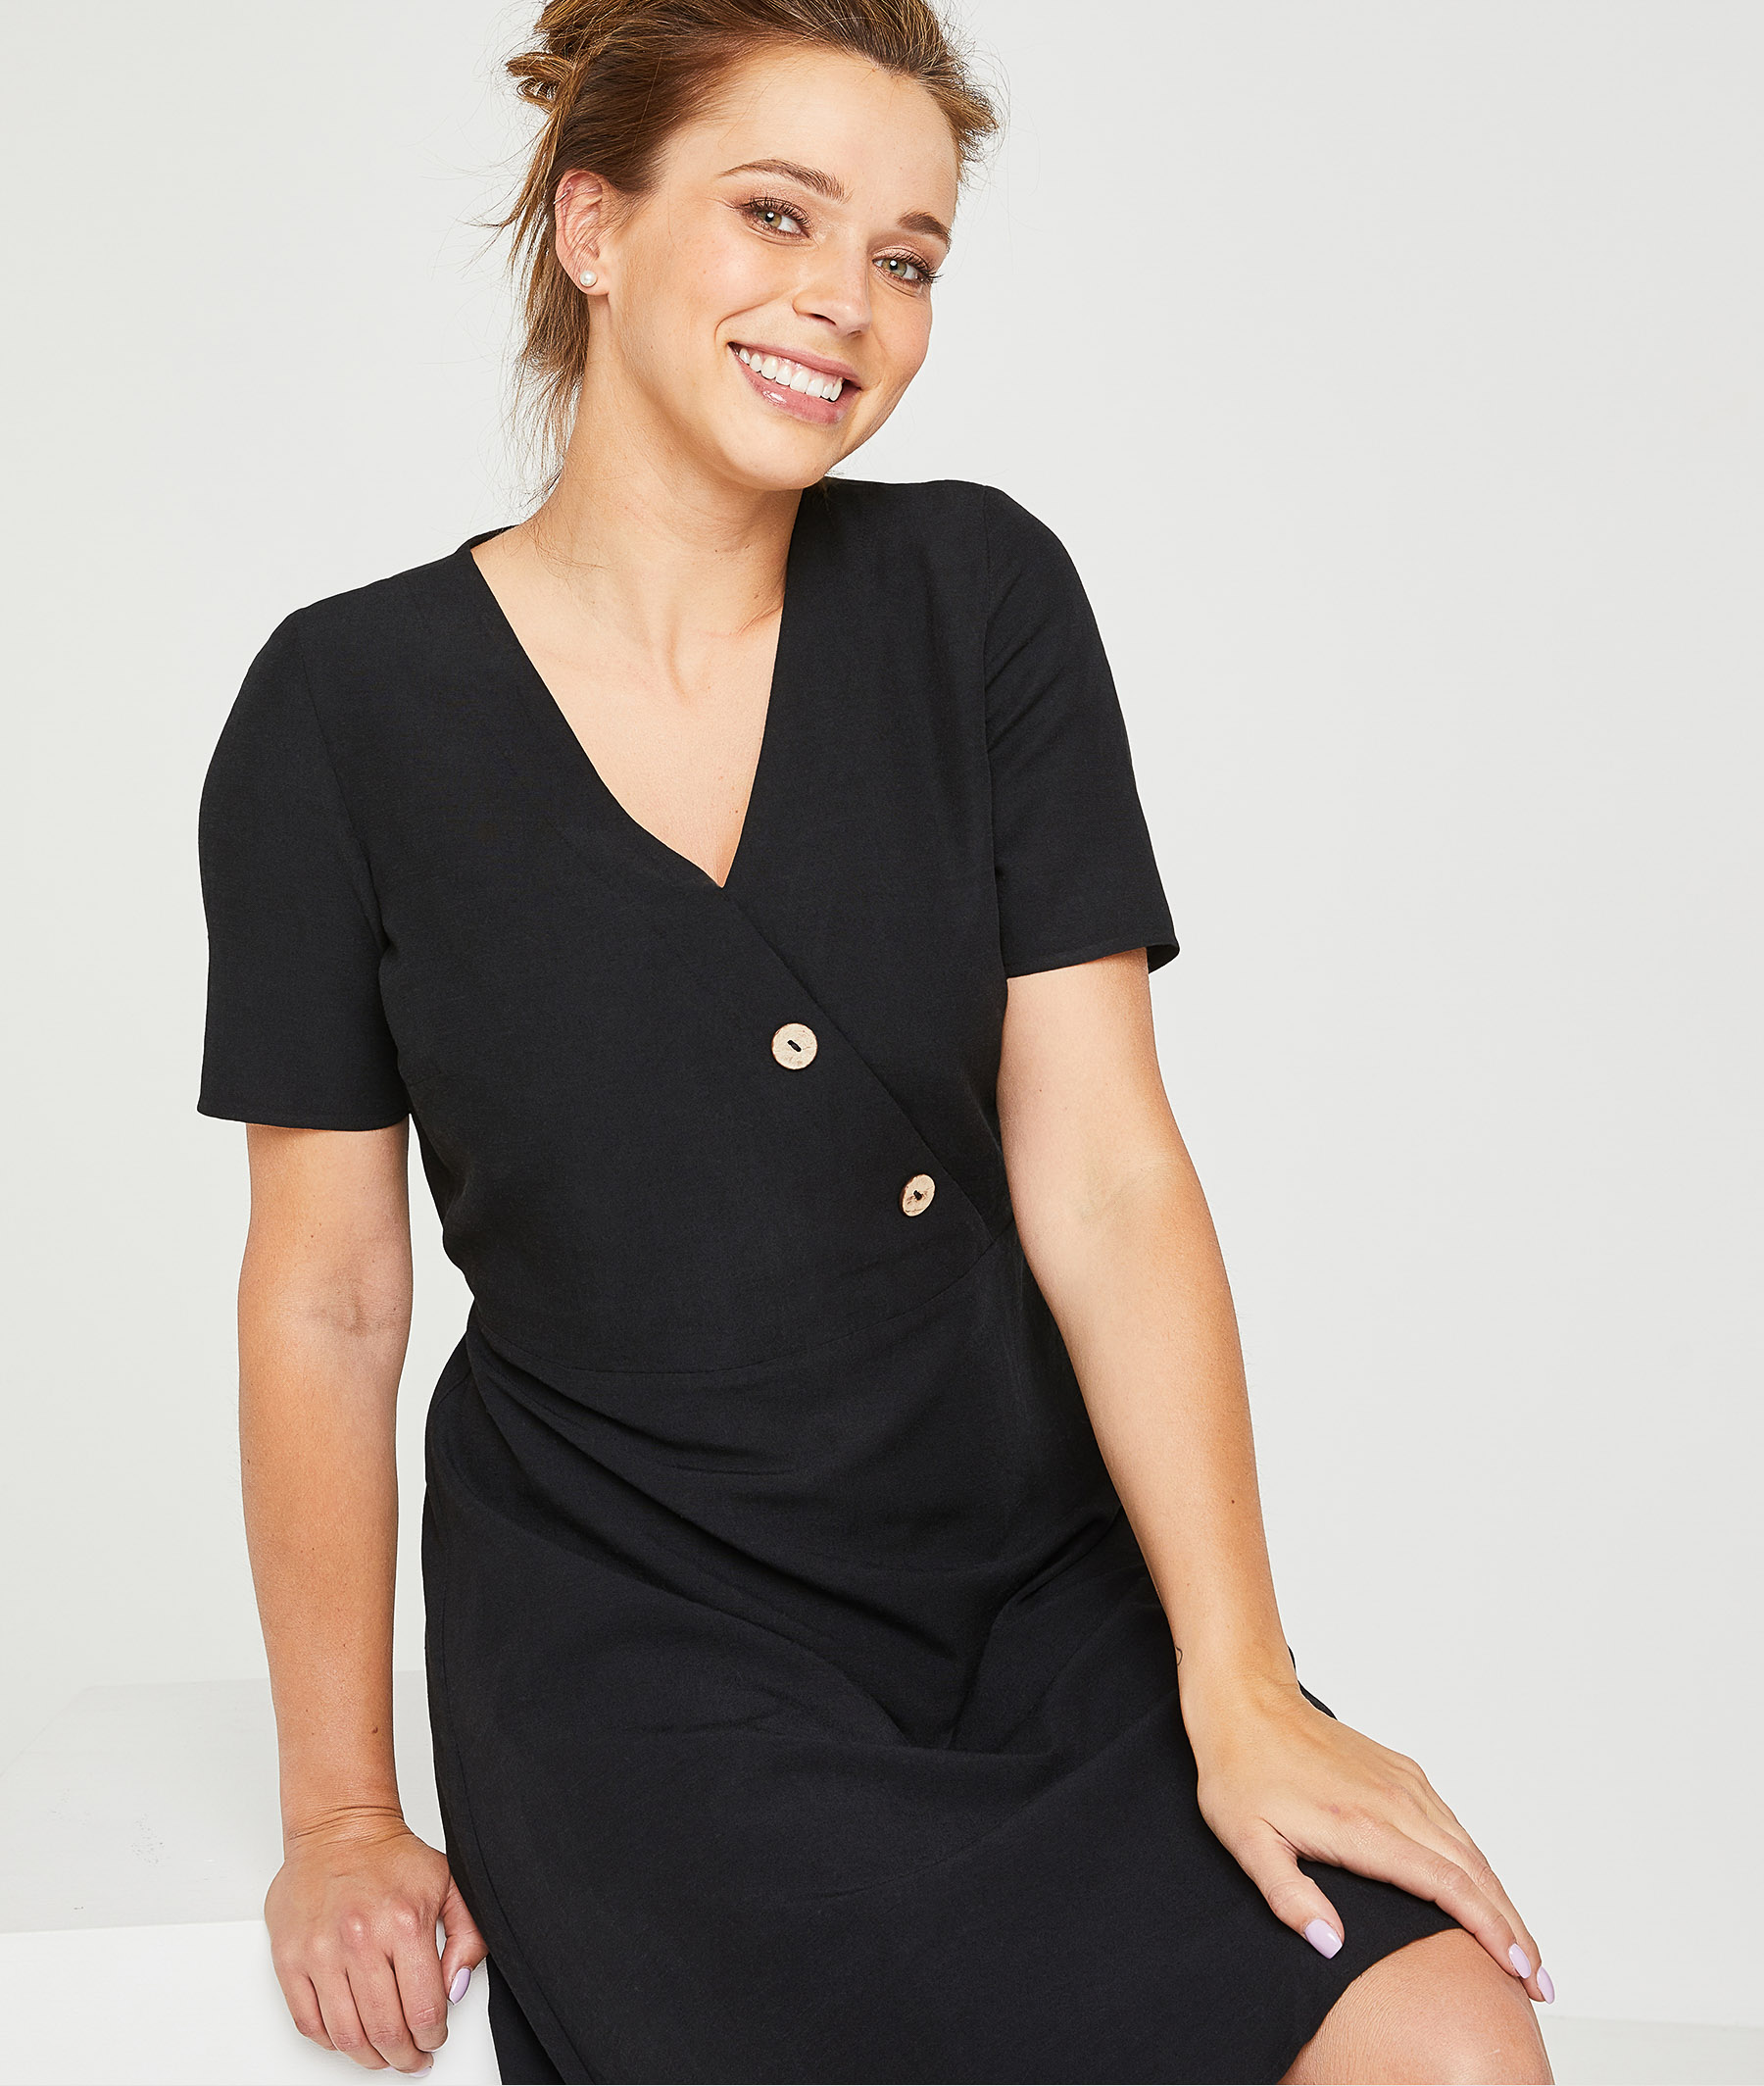 Robe noire courte femme NOIR